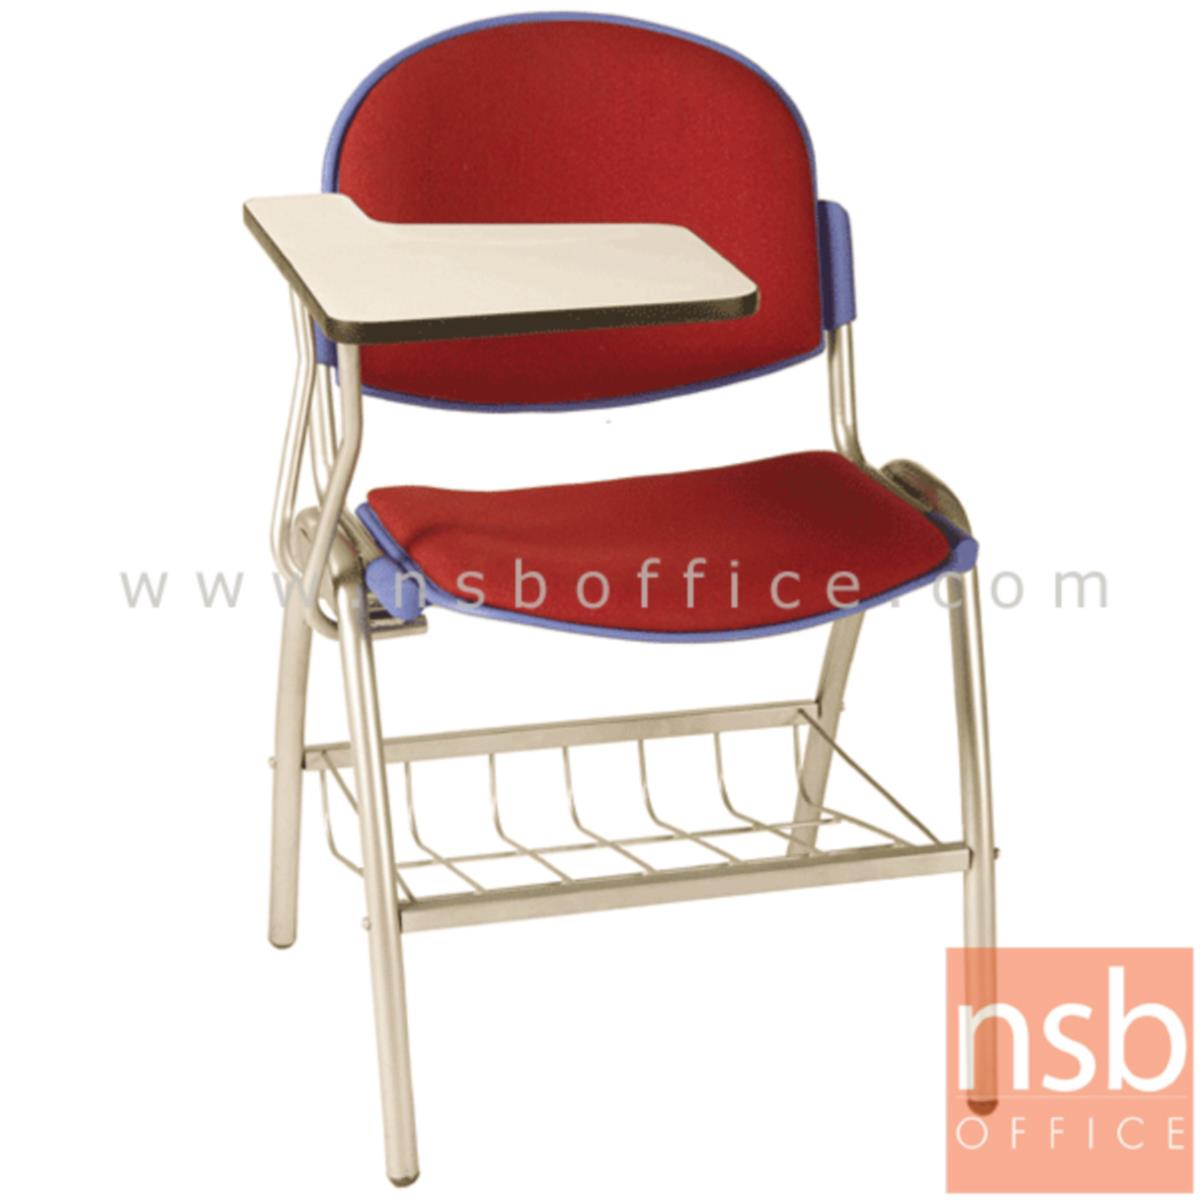 B07A053:เก้าอี้เลคเชอร์เฟรมโพลี่ รุ่น C256-646 (มีตะแกรงวางของ) ขาเหล็กพ่นสี